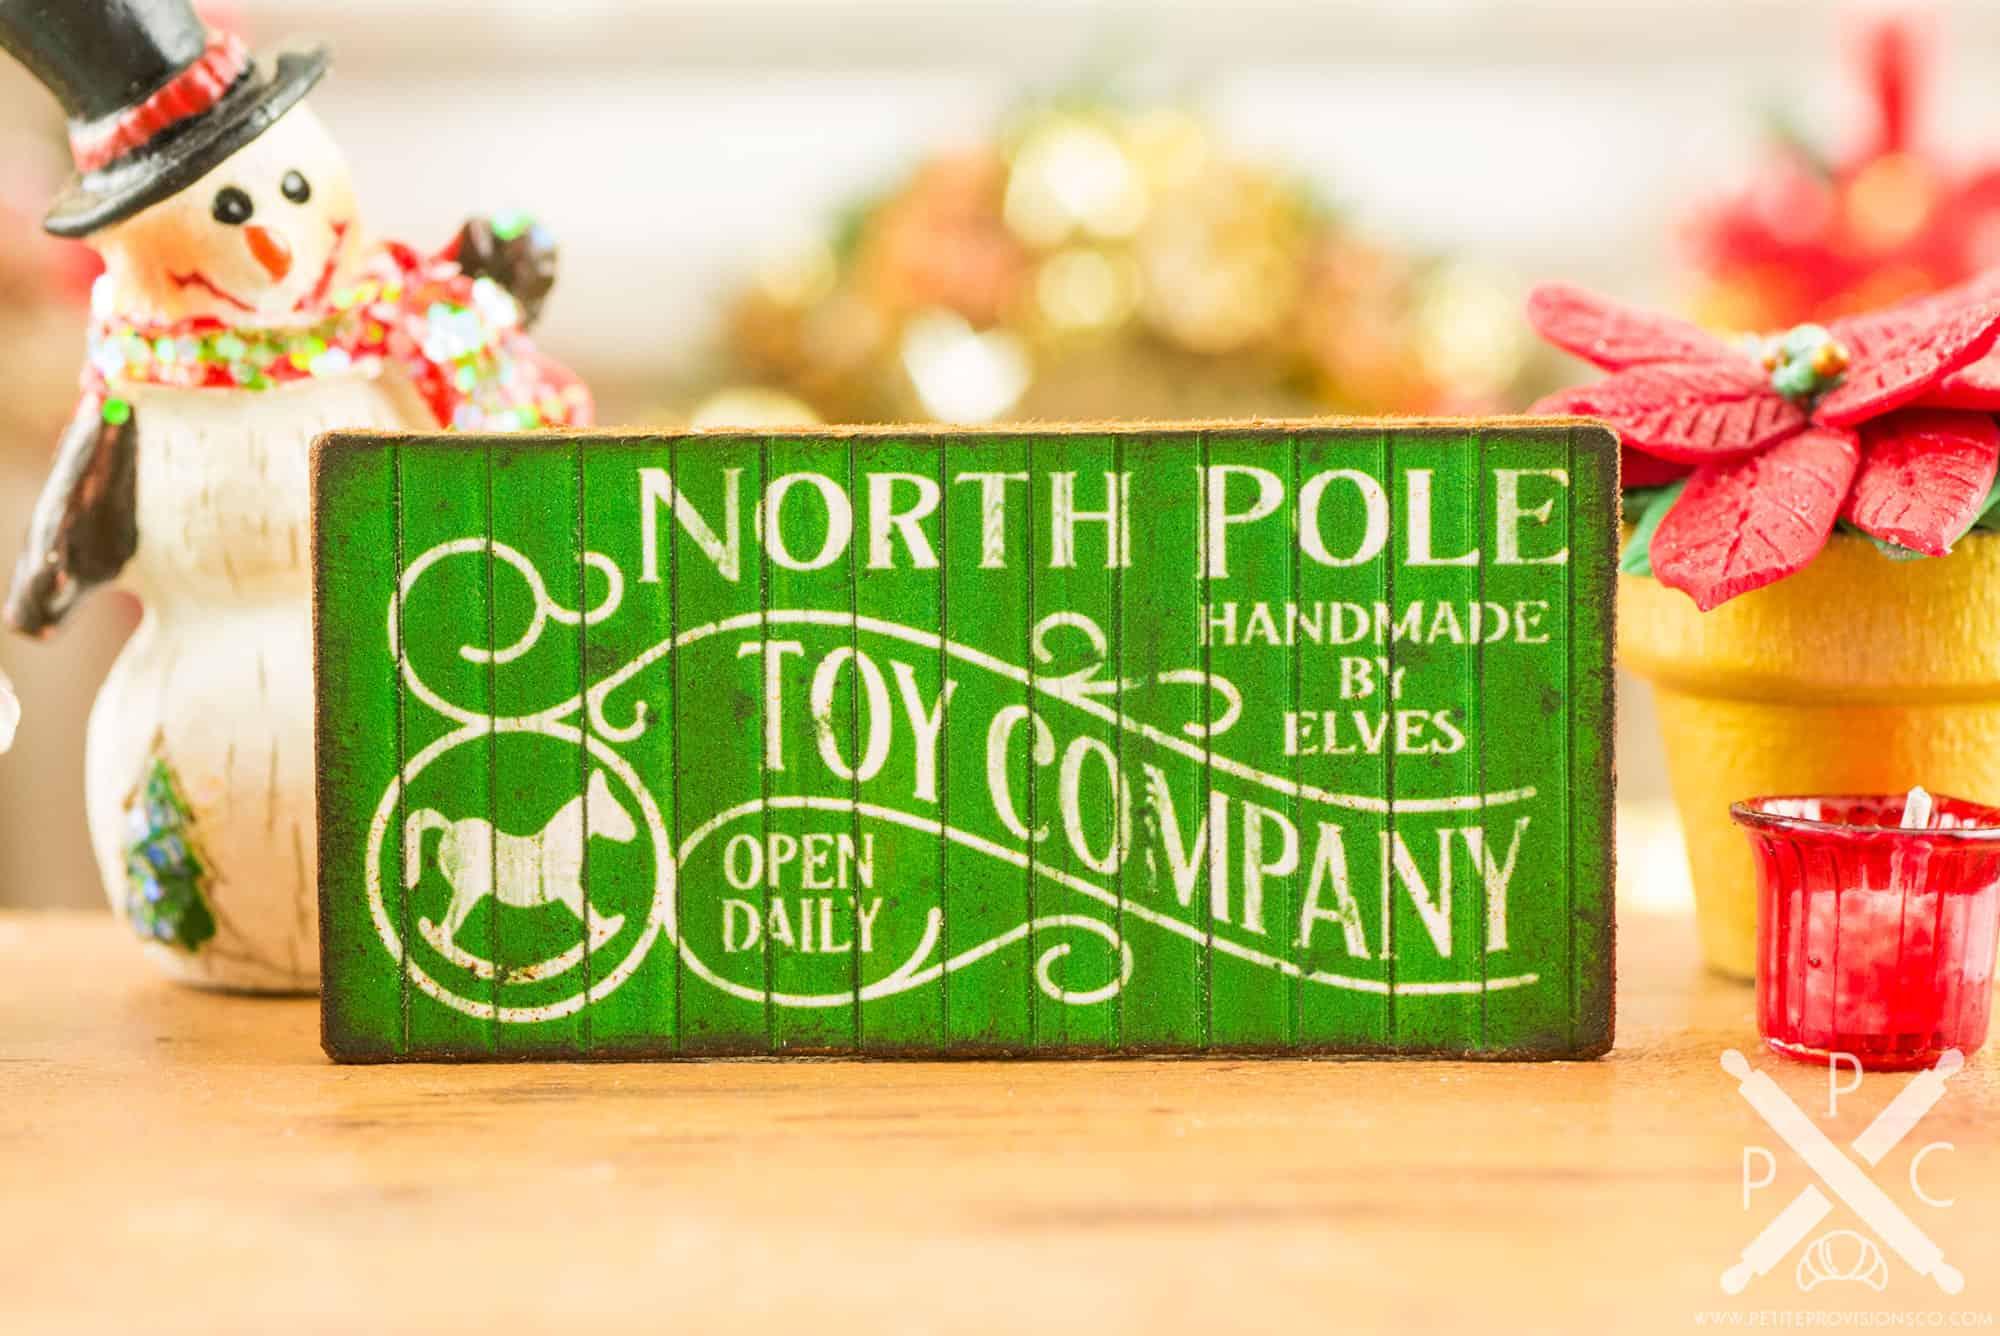 Miniature North Pole Toy Company Sign - 1:12 Dollhouse Miniature ...